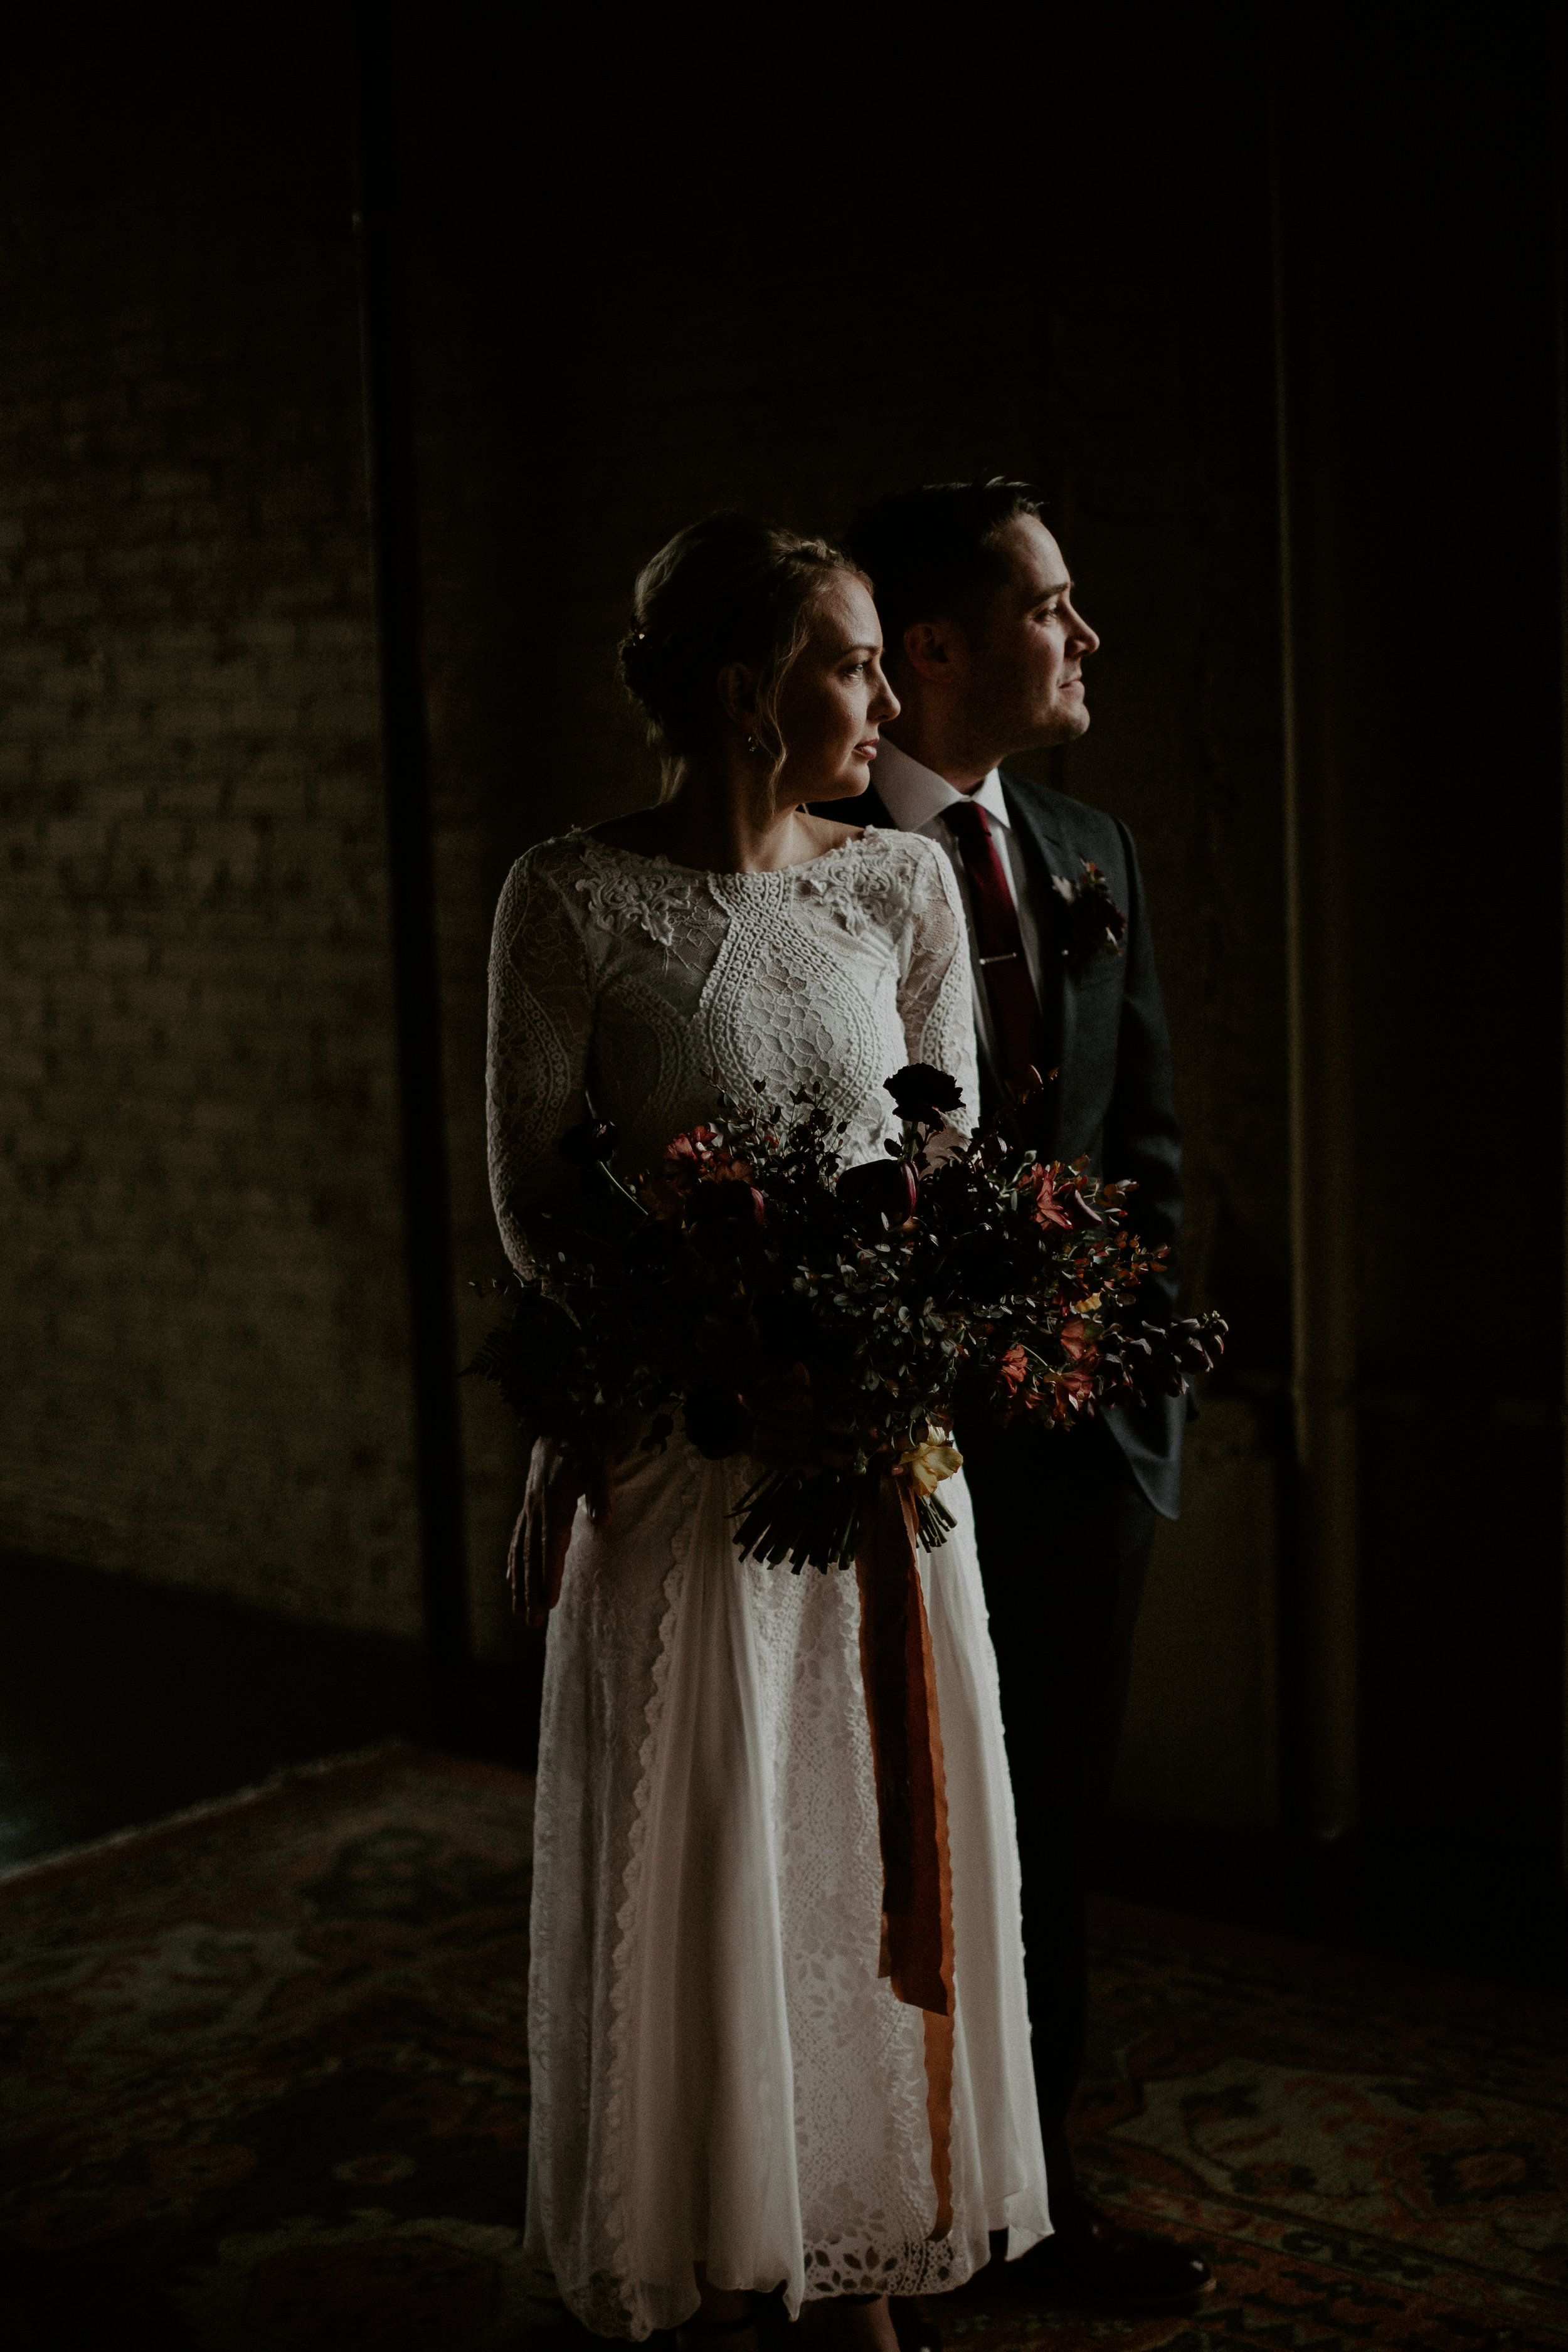 The_Steam_Plant_Dayton_Wedding-EDIT-147.jpg